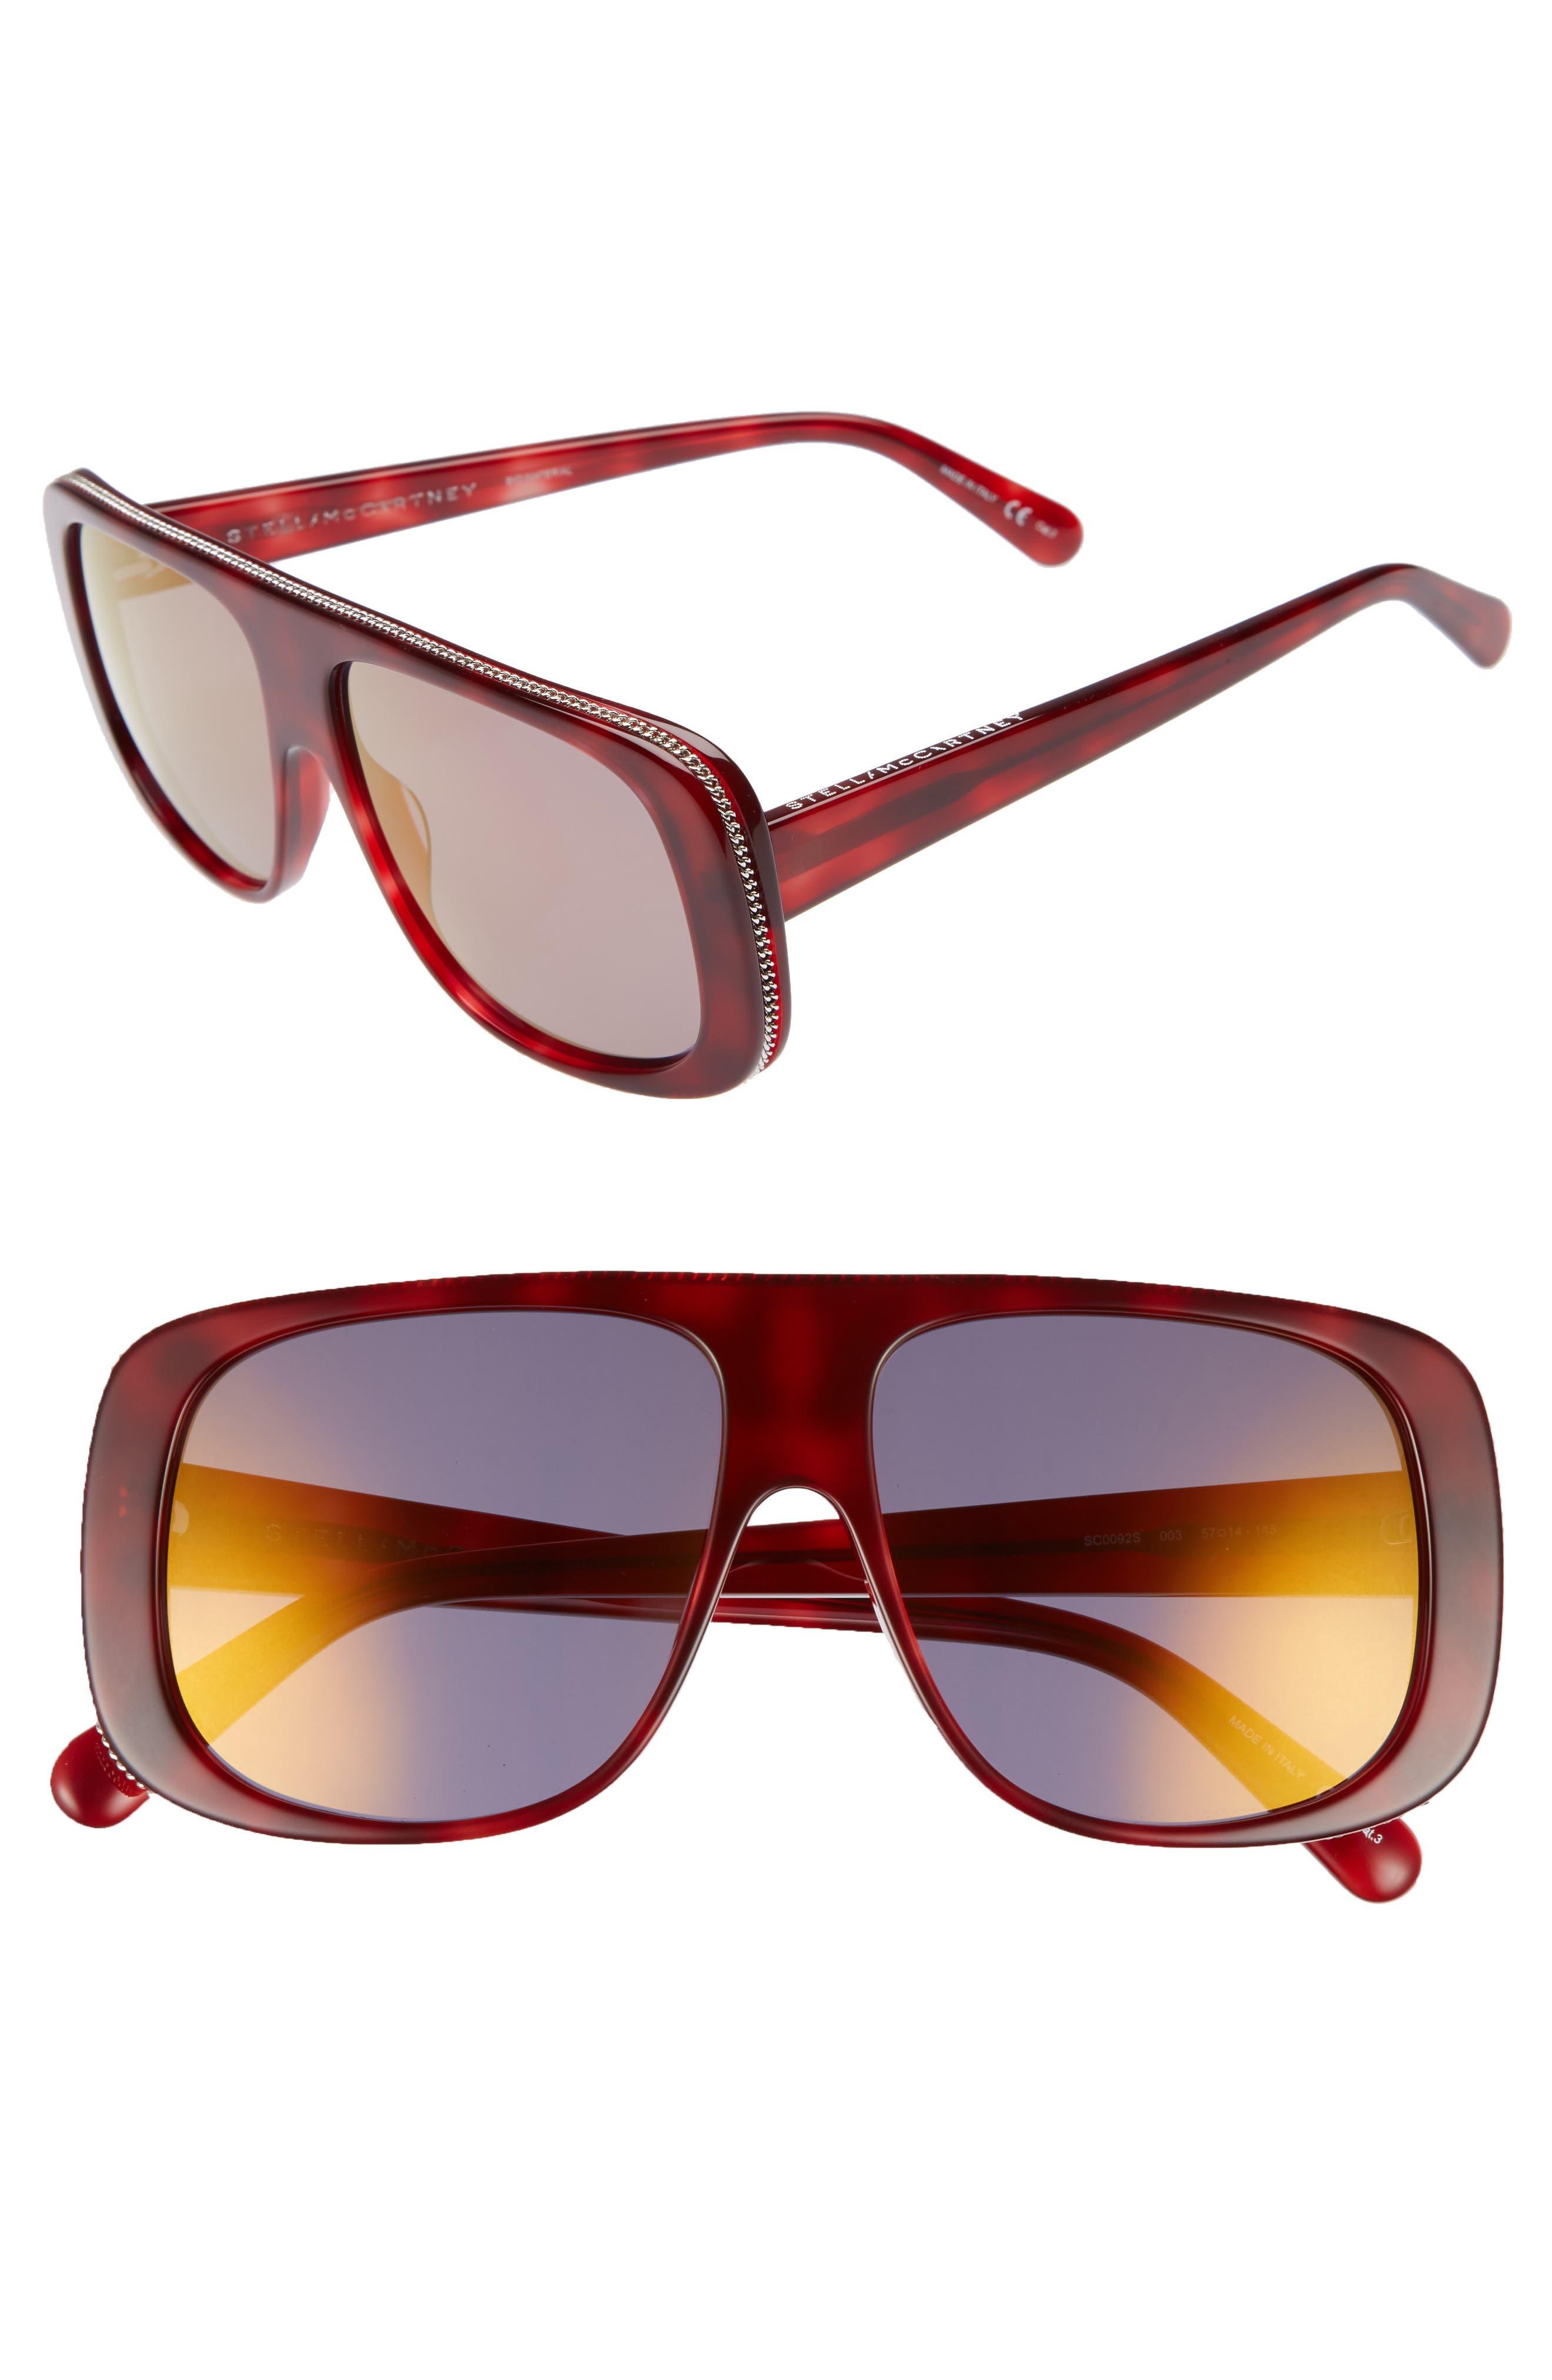 57mm Flat Top Sunglasses,                         Main,                         color, Avana